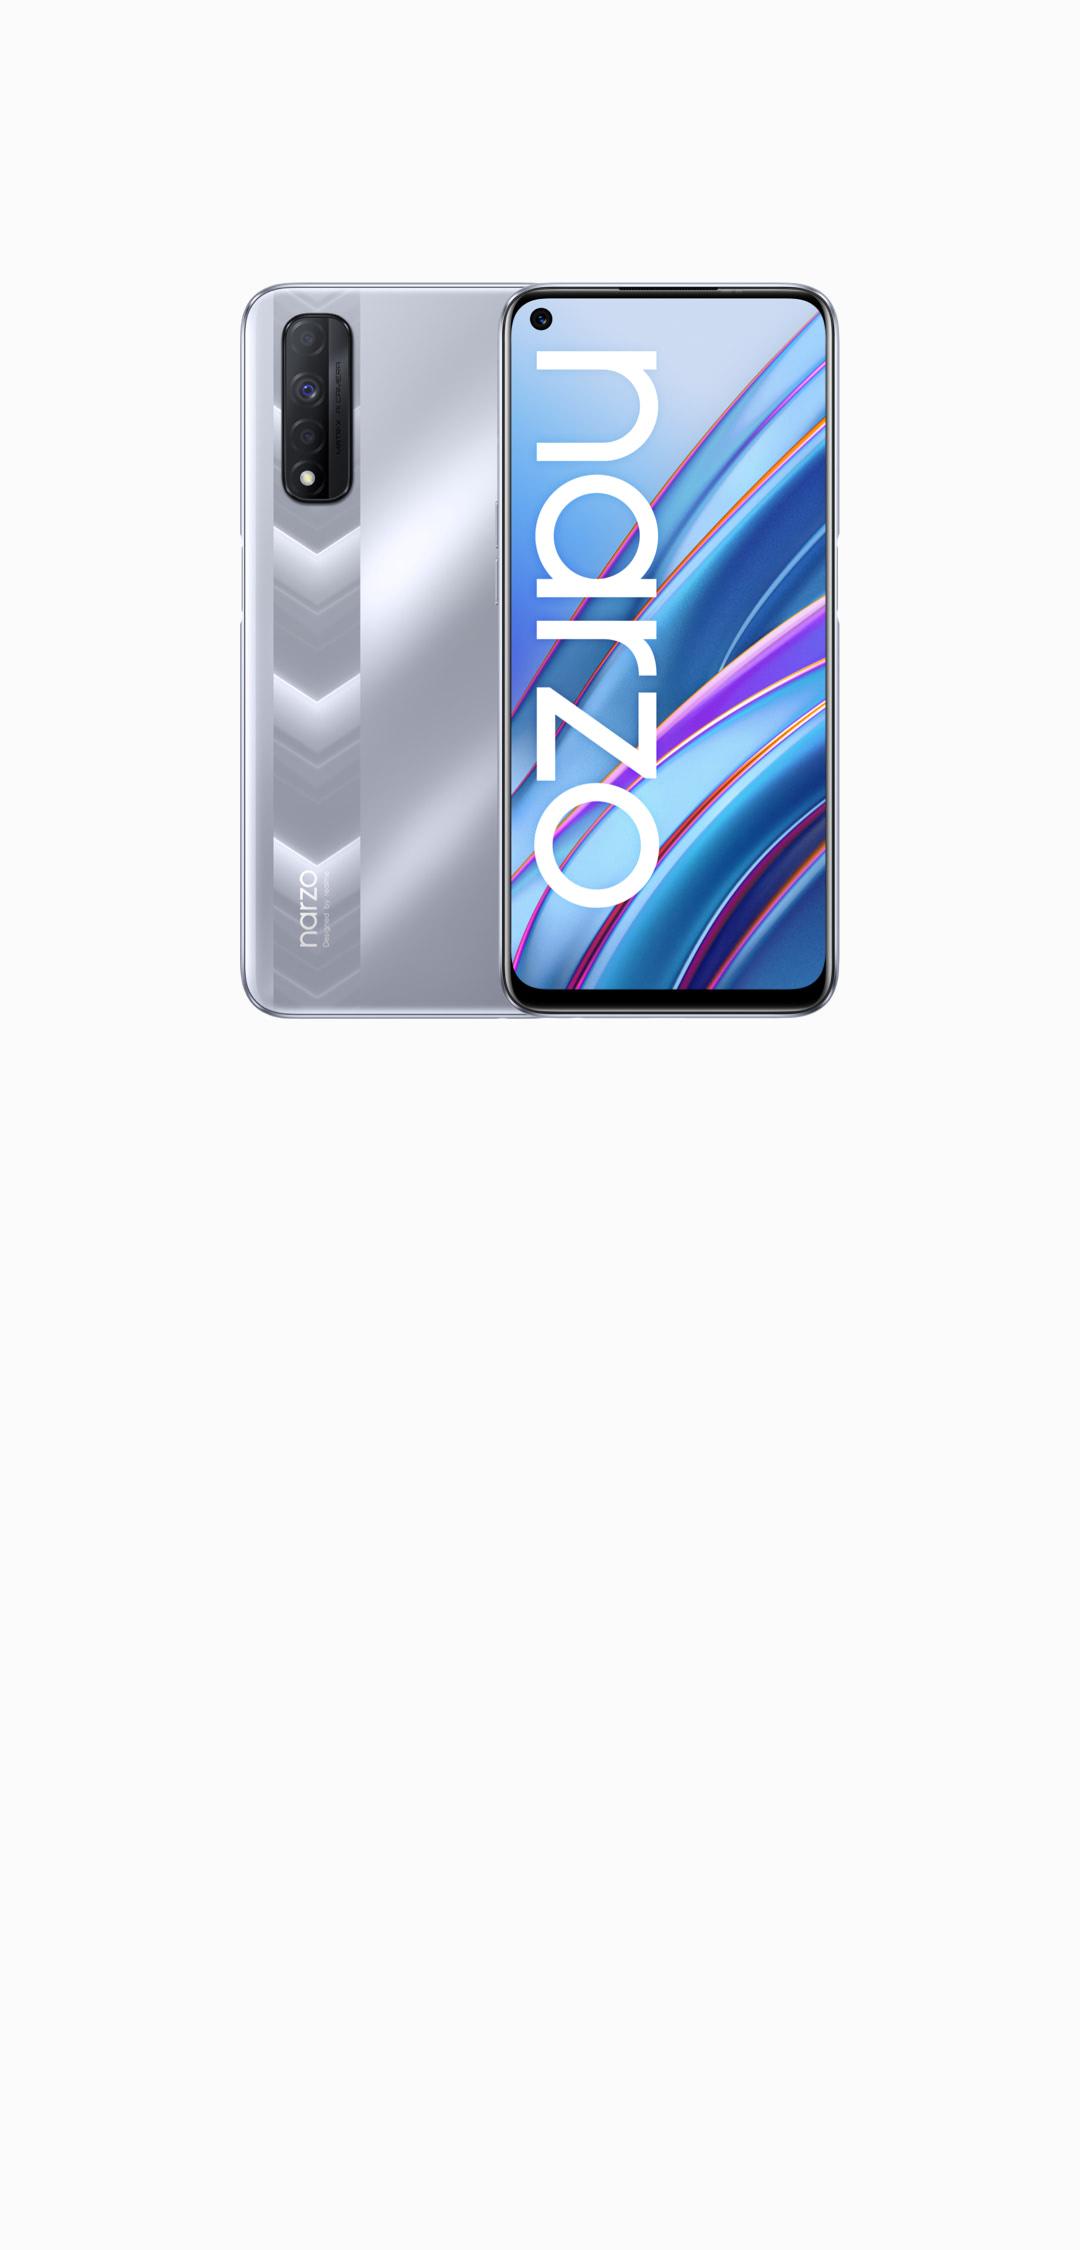 Realme Narzo 30 Price in Pakistan